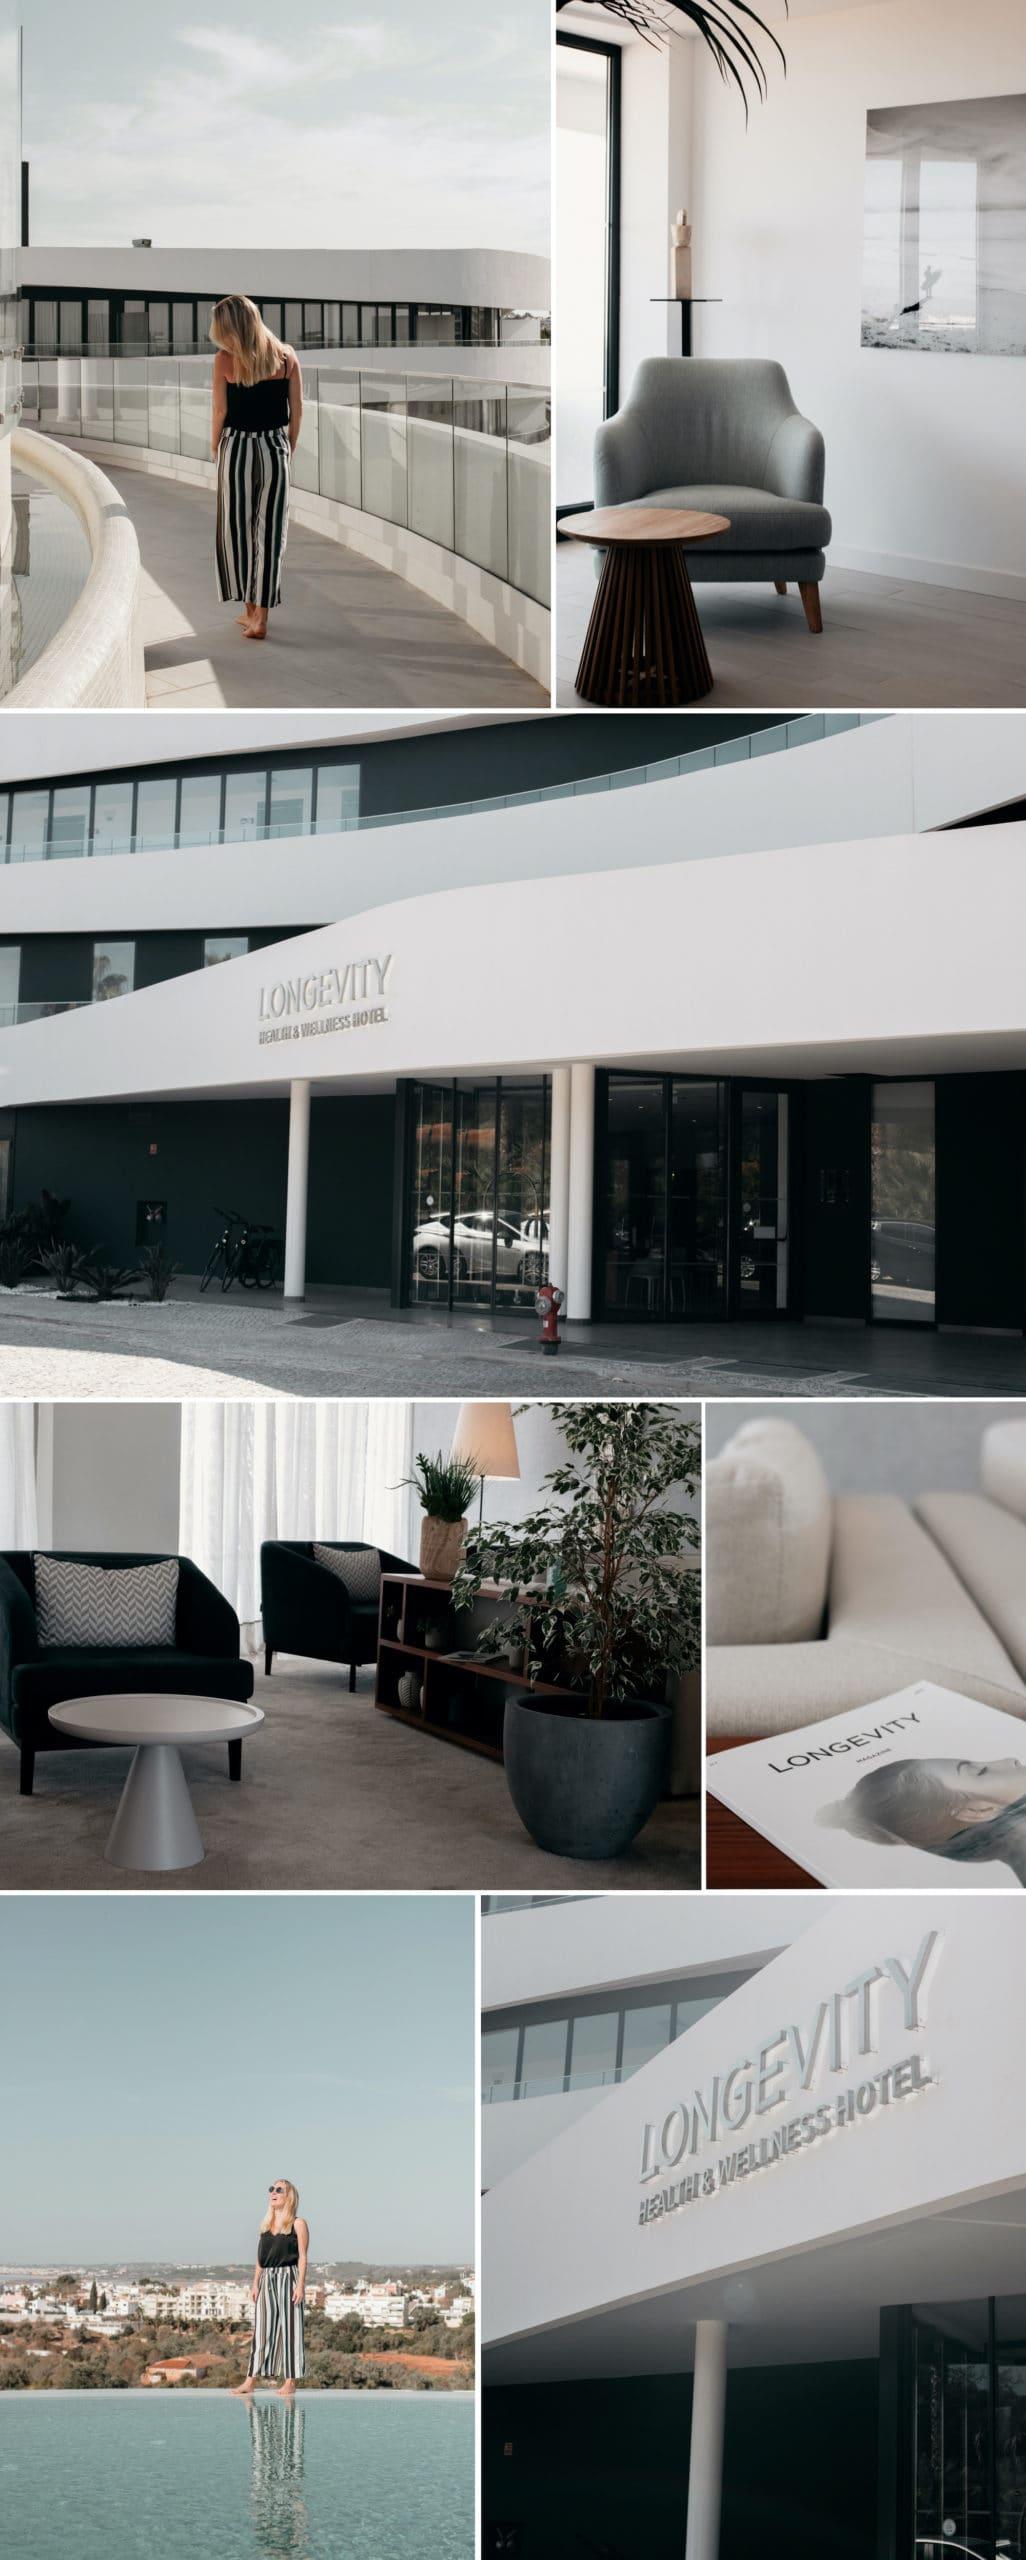 longevity wellness health hotel algarve